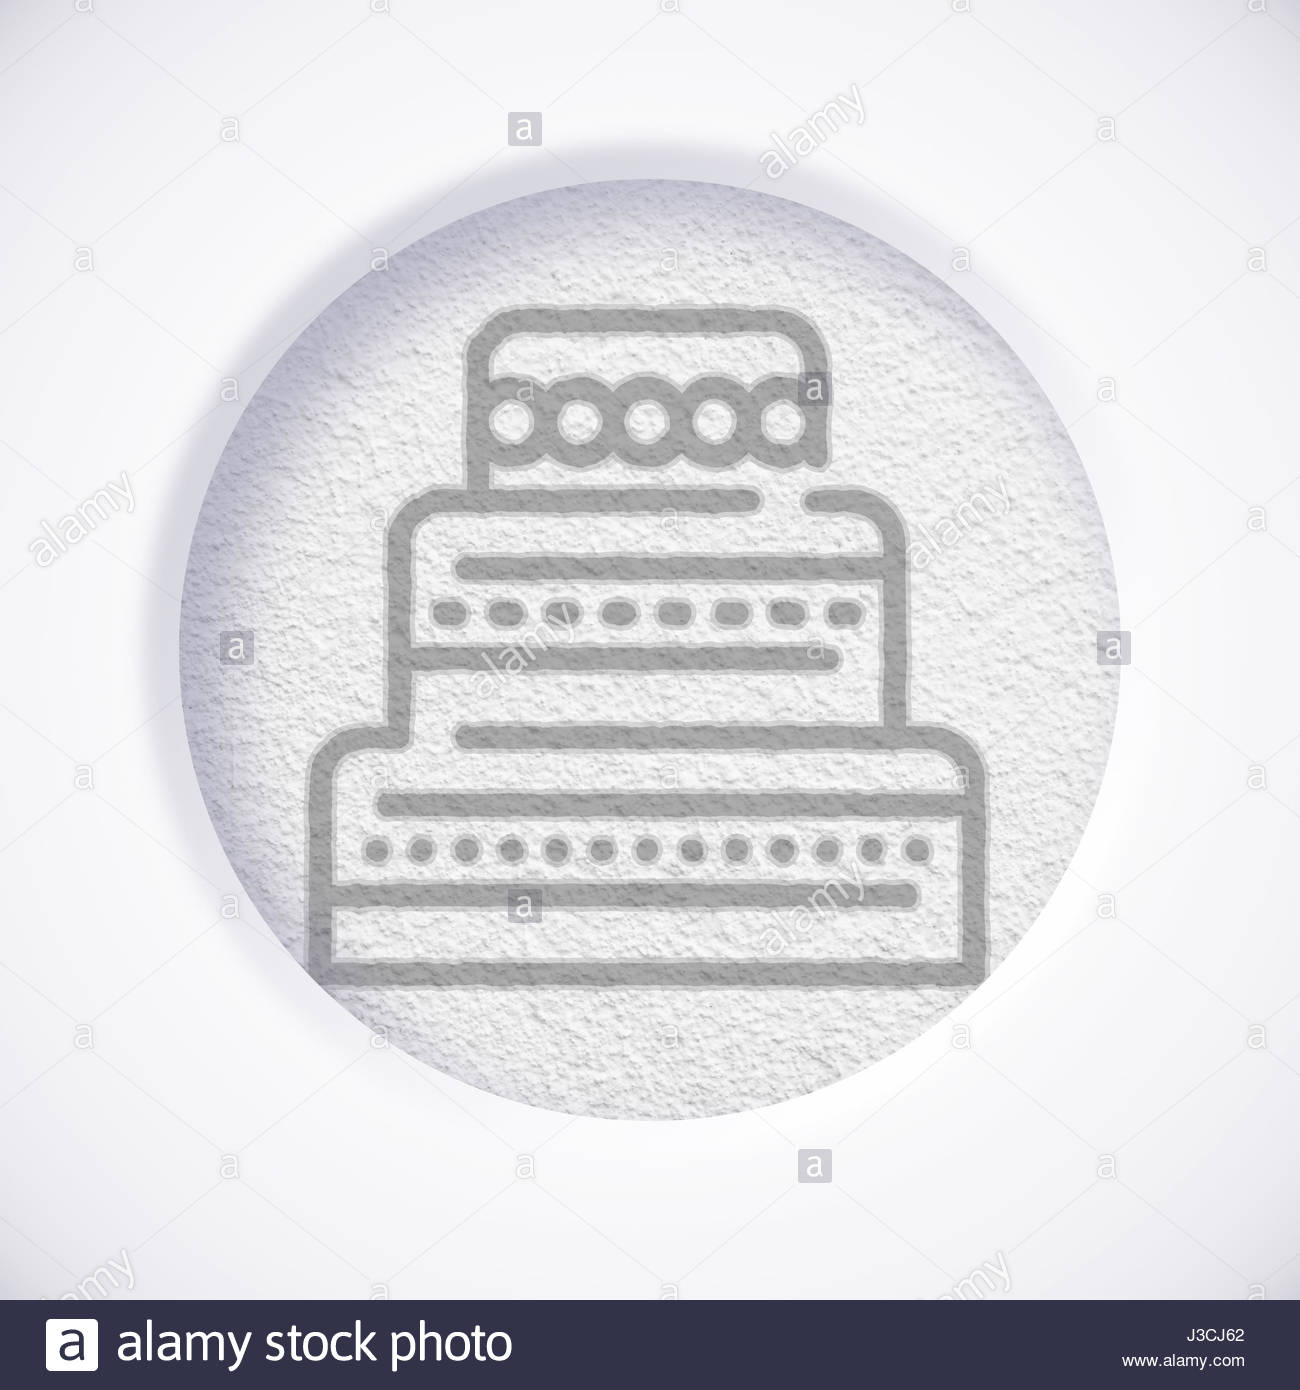 White cake symbol icon concept stock photo royalty free image white cake symbol icon concept buycottarizona